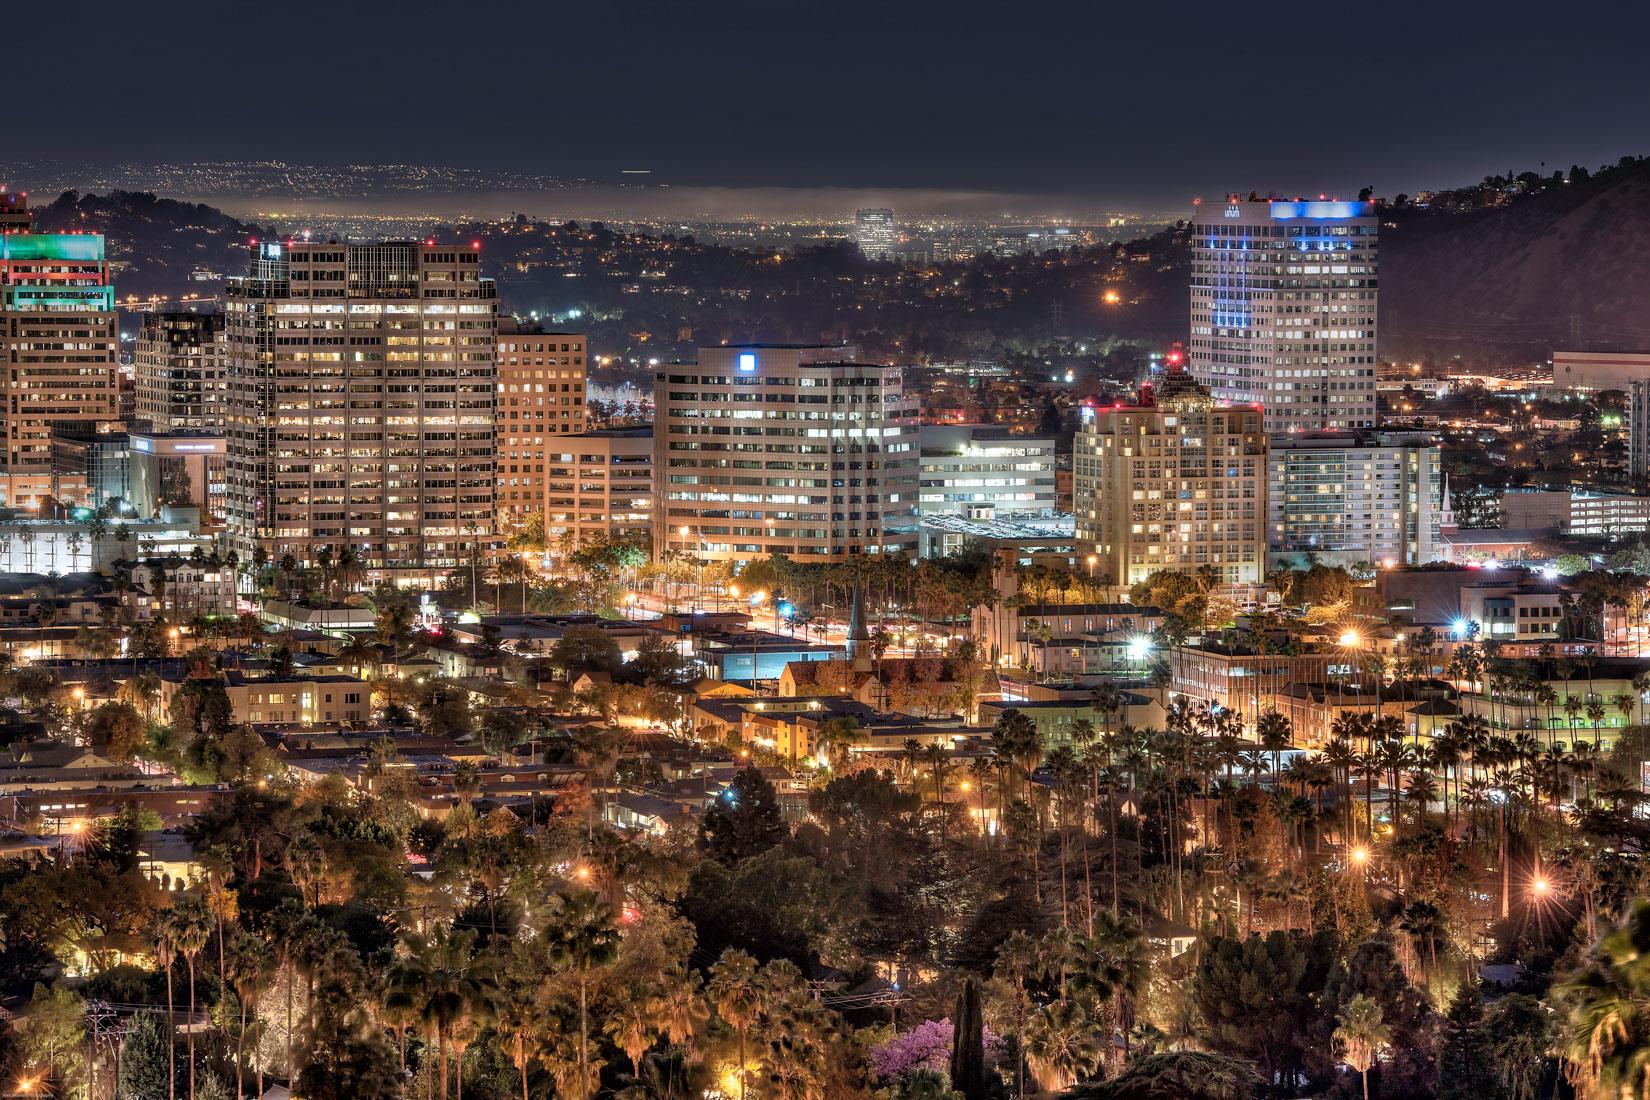 Glendale Vista